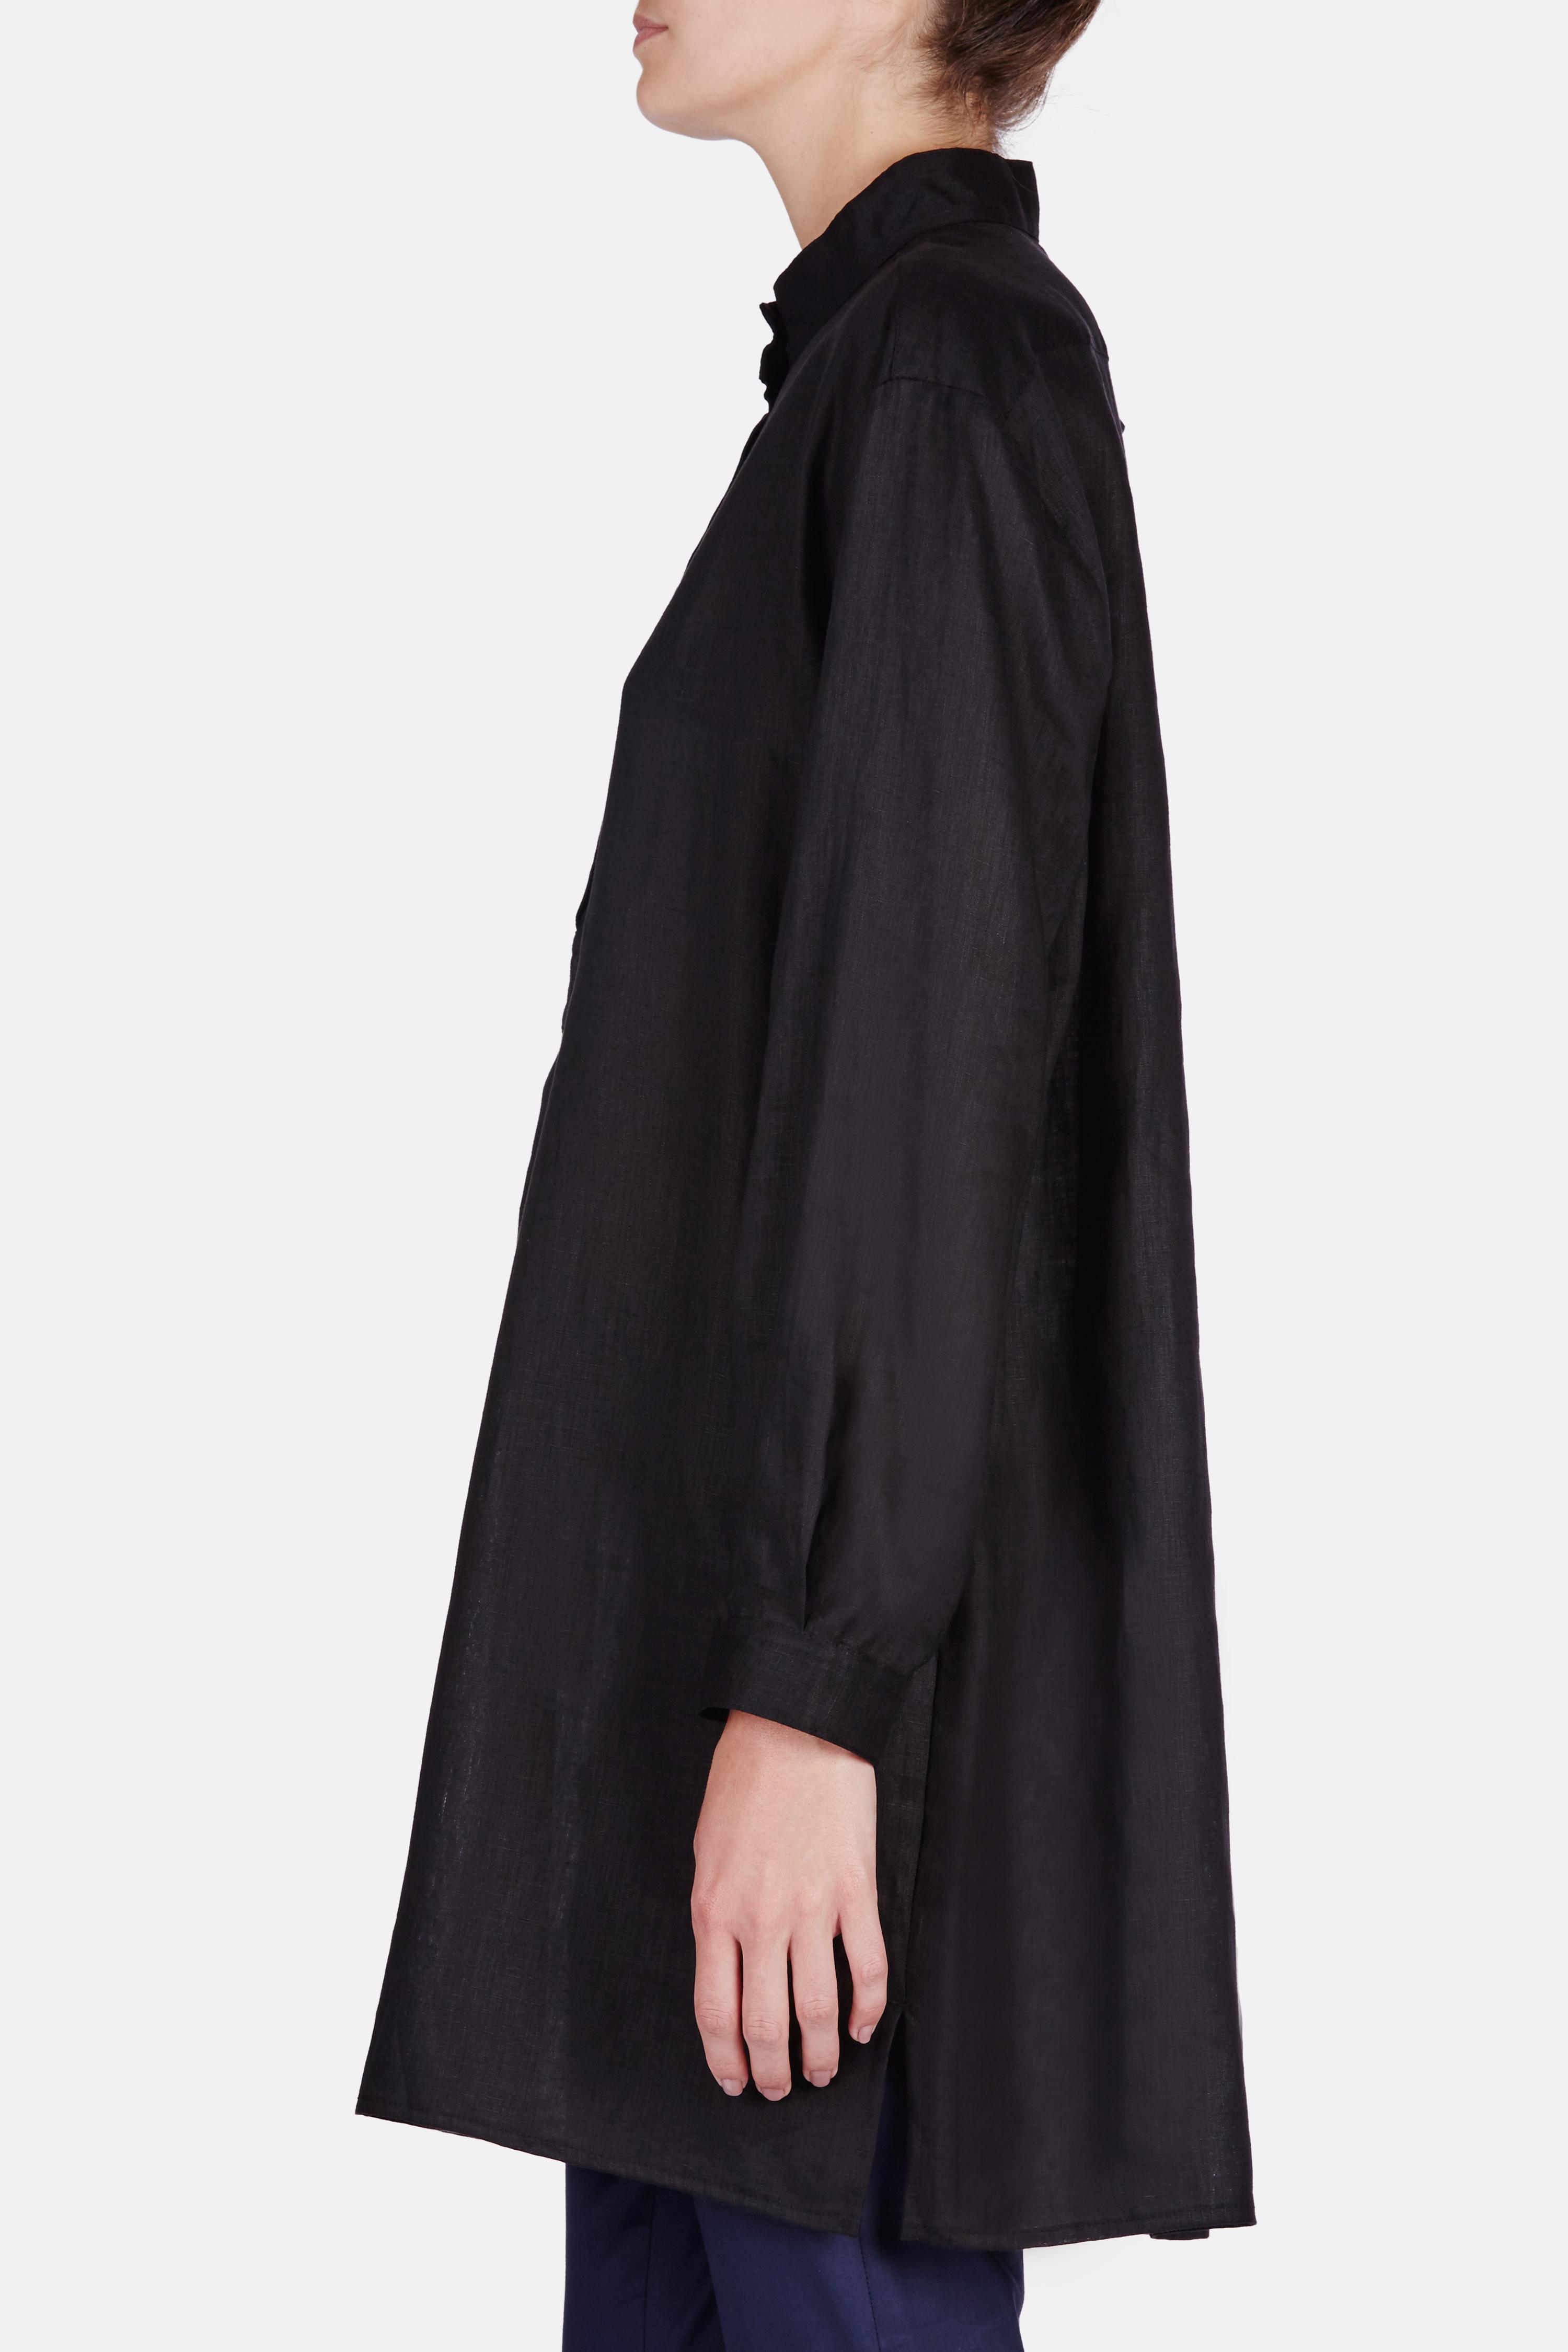 The Sleep Shirt Short Sleep Shirt In Black Lyst